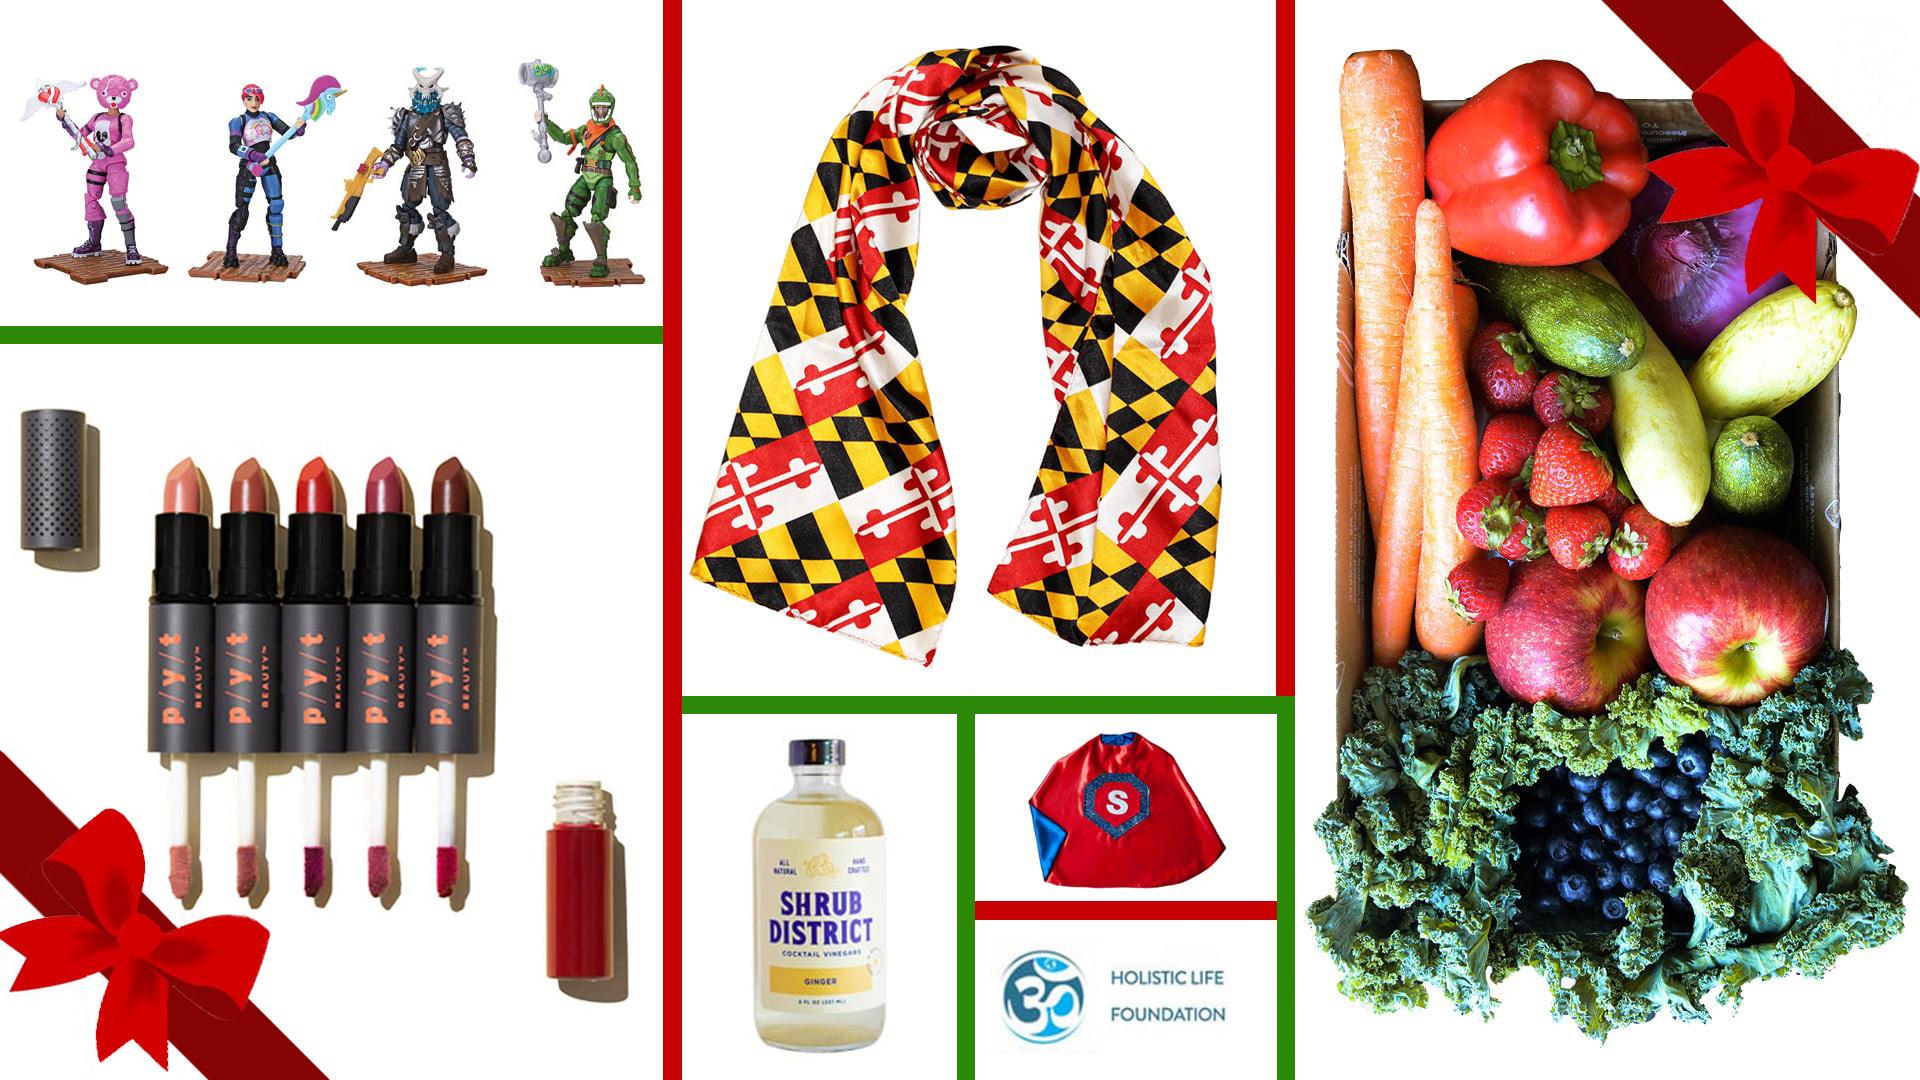 UMD Holiday Gifts